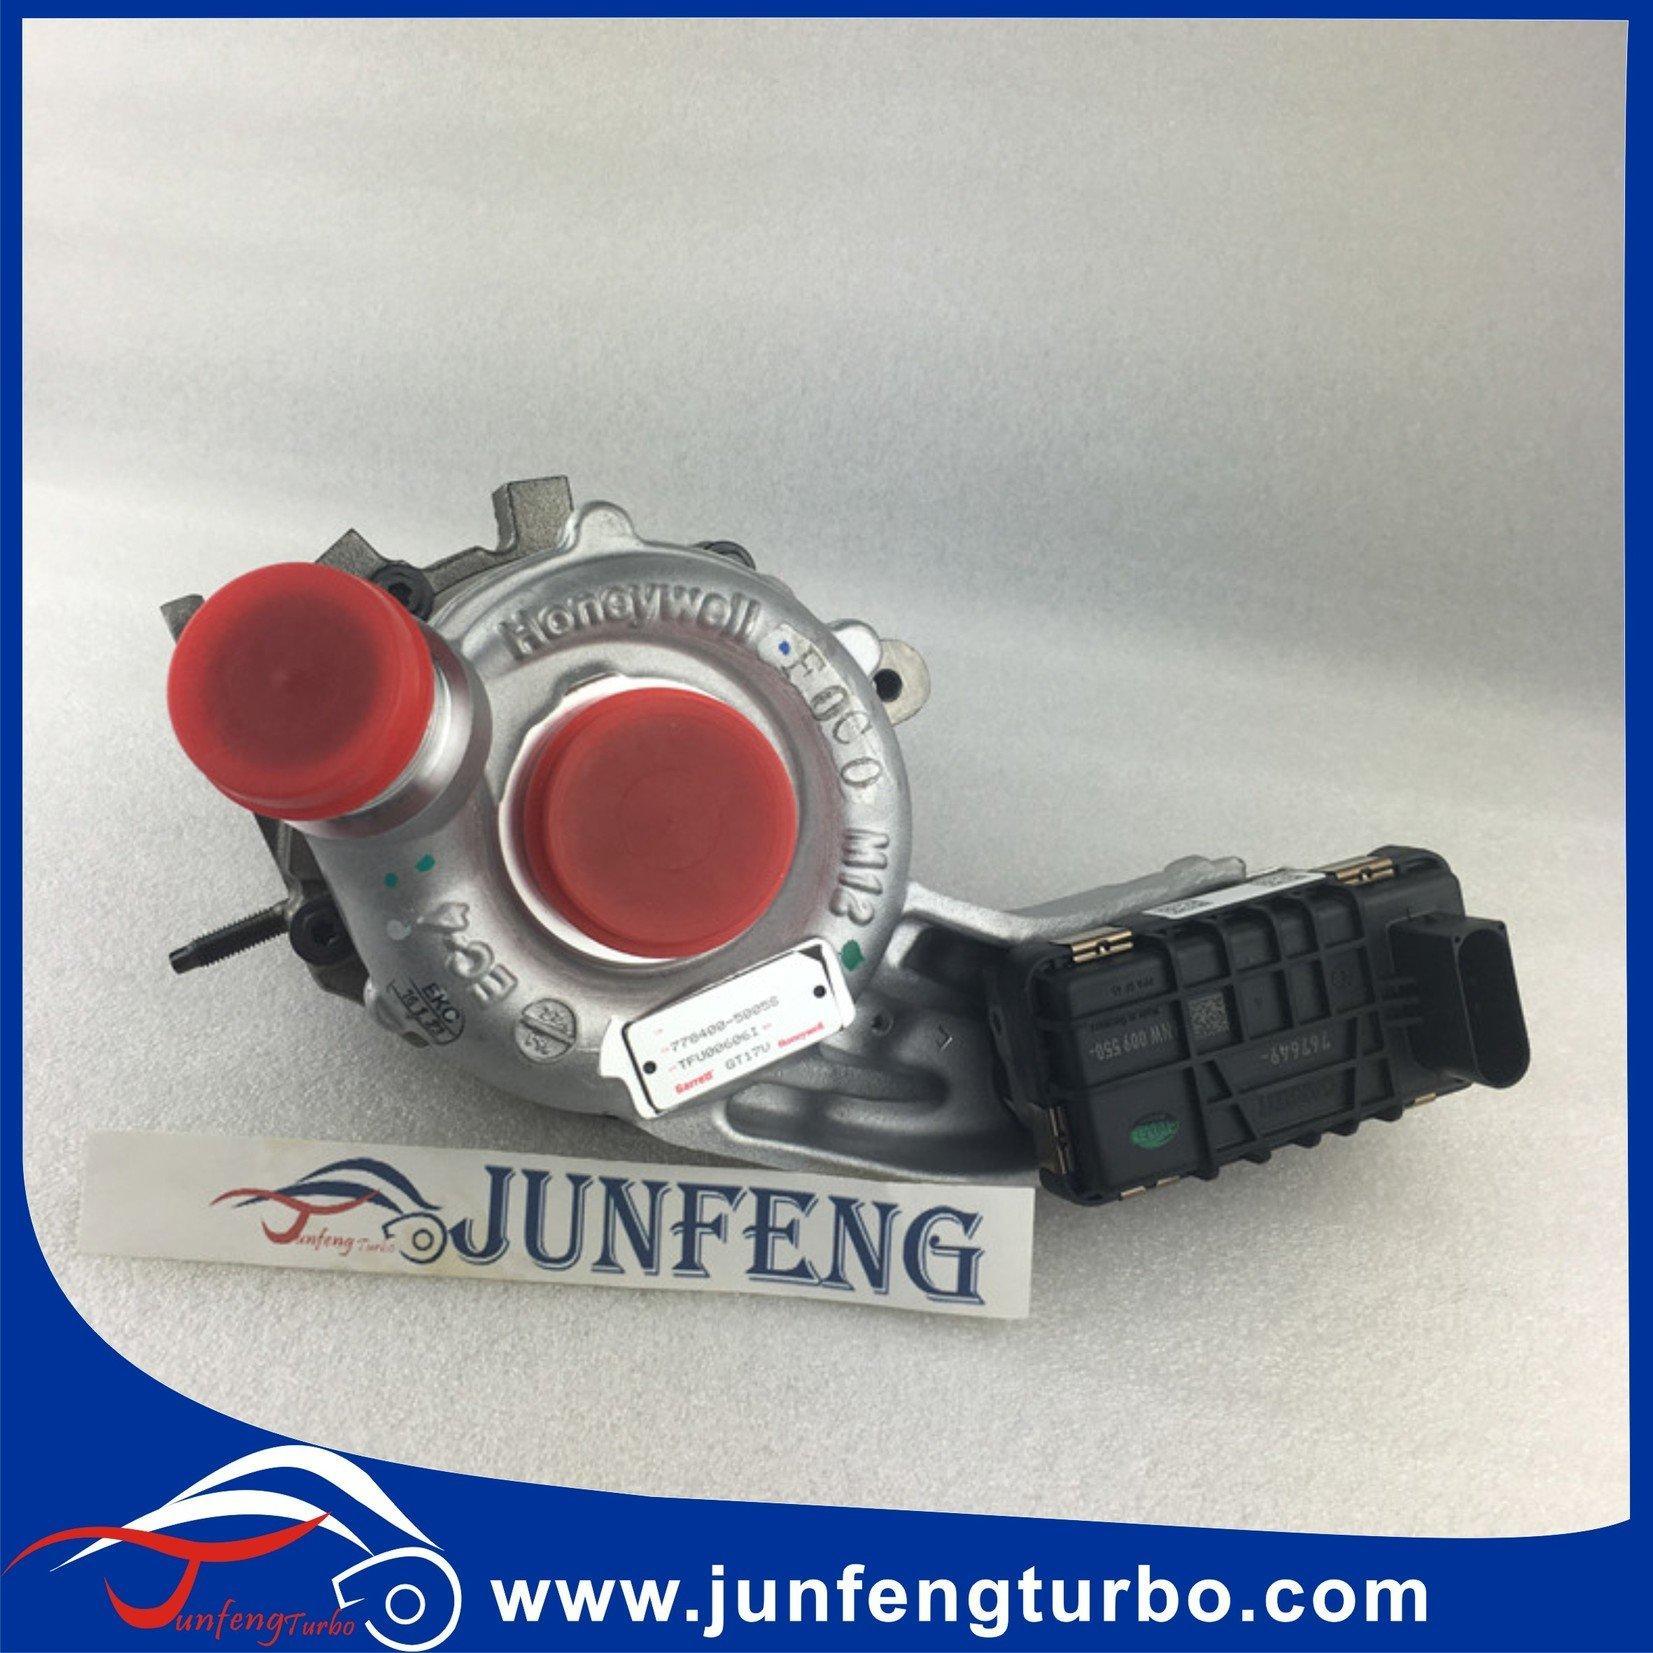 GT17V twin turbo 778400-0005 LR013202 turbocharger 778400-0001